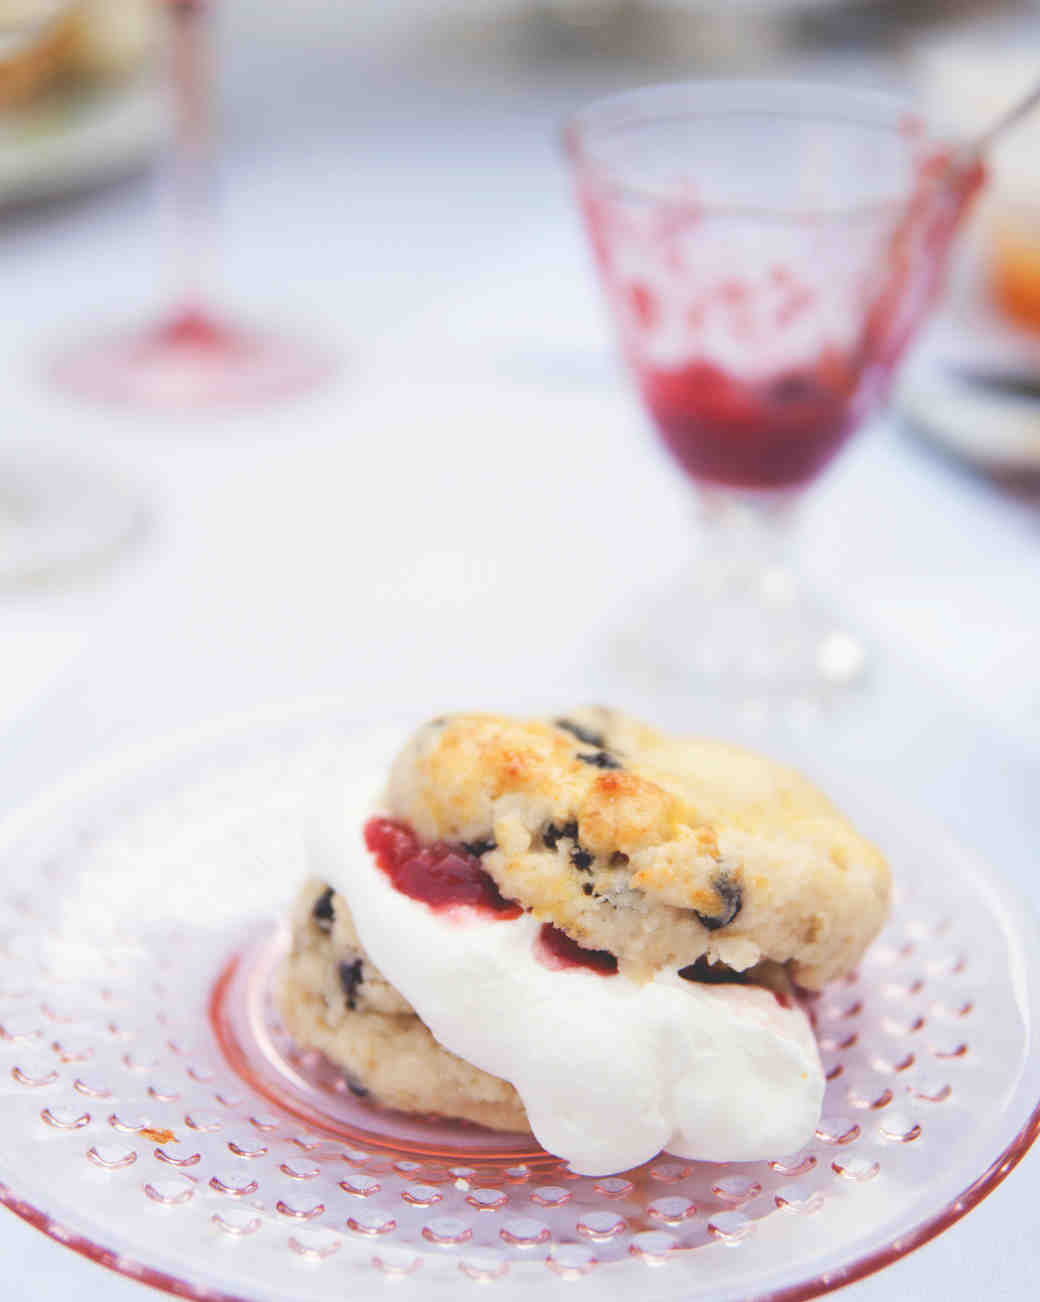 claire-thomas-bridal-shower-scone-jam-and-cream-0215.jpg